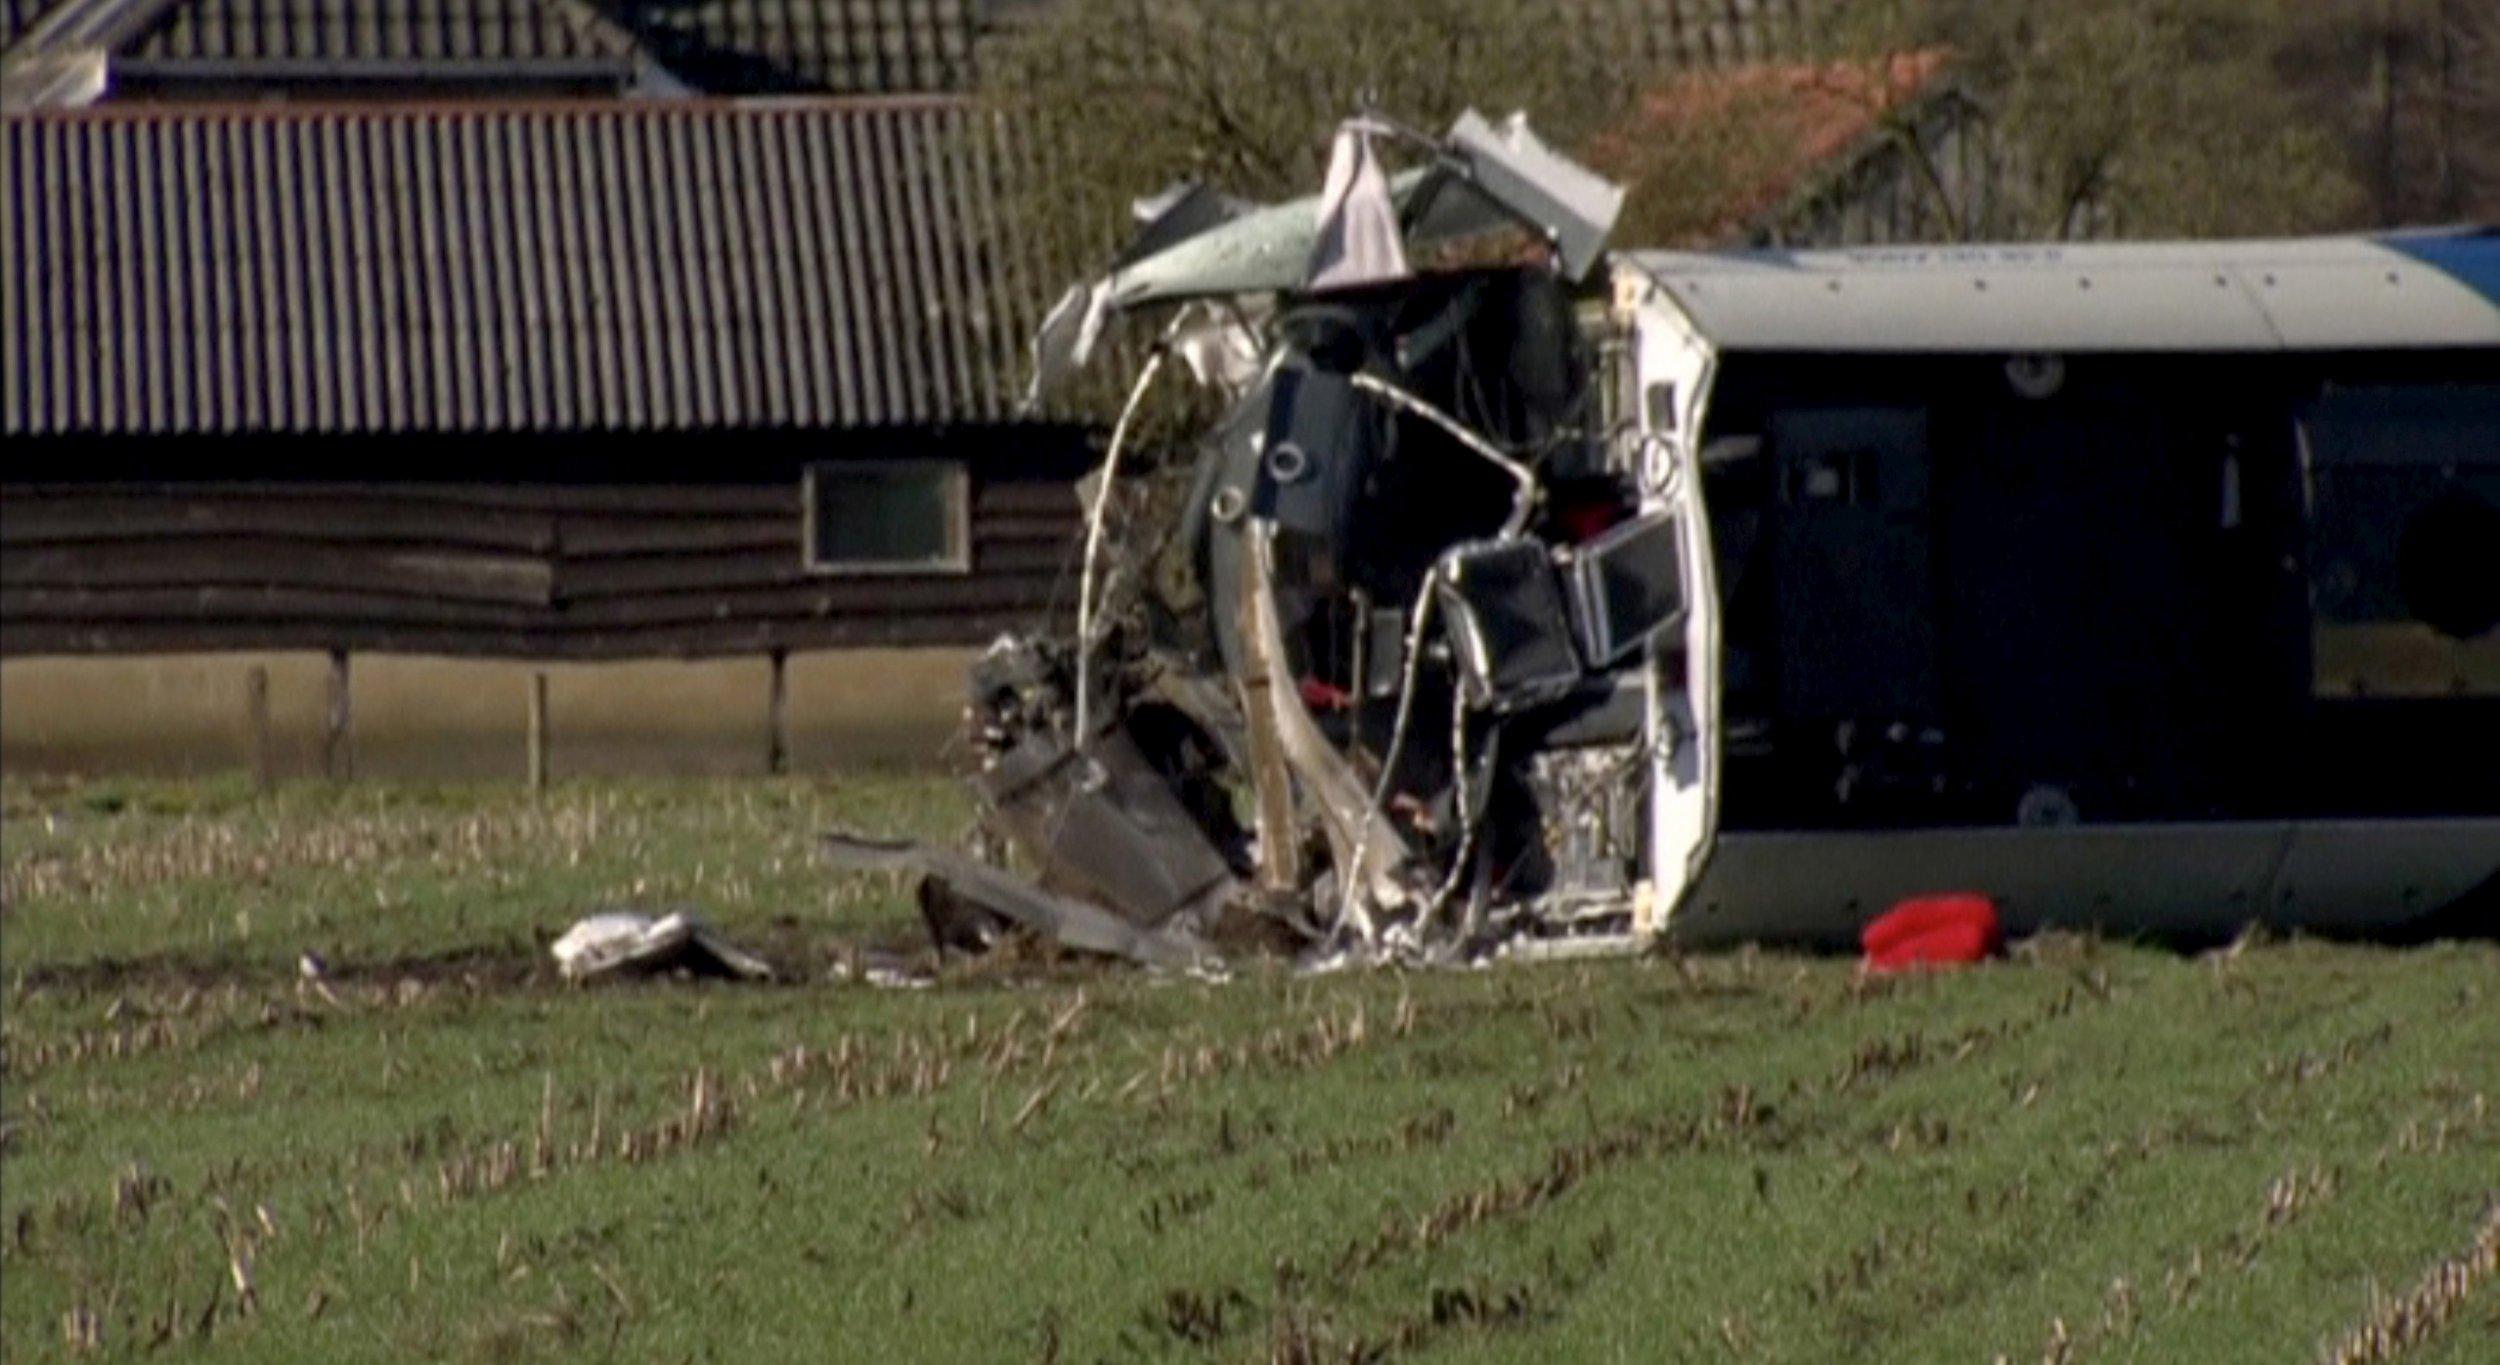 02_23_netherlands_train_crash_01